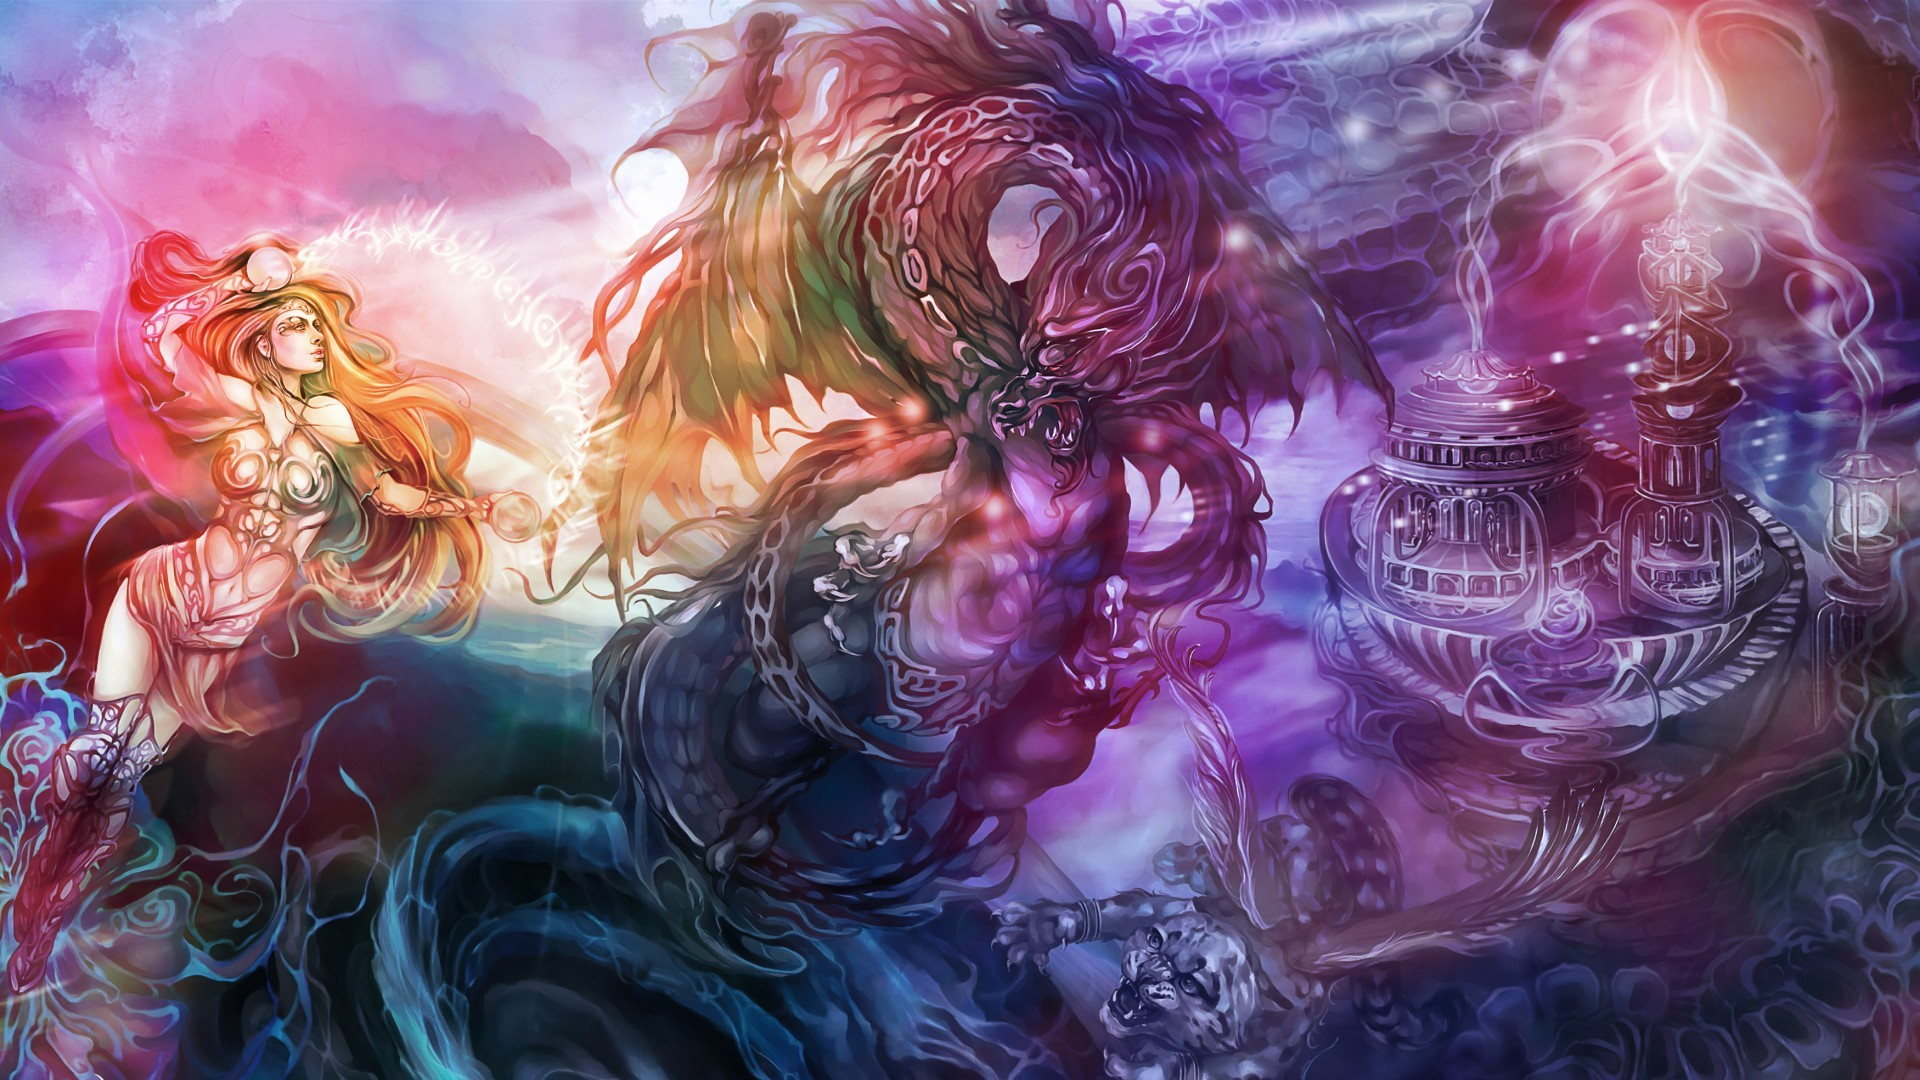 Gothic Art Dragon Screensaver   fantasy art dragon magic women females  girls castle dark wallpaper .